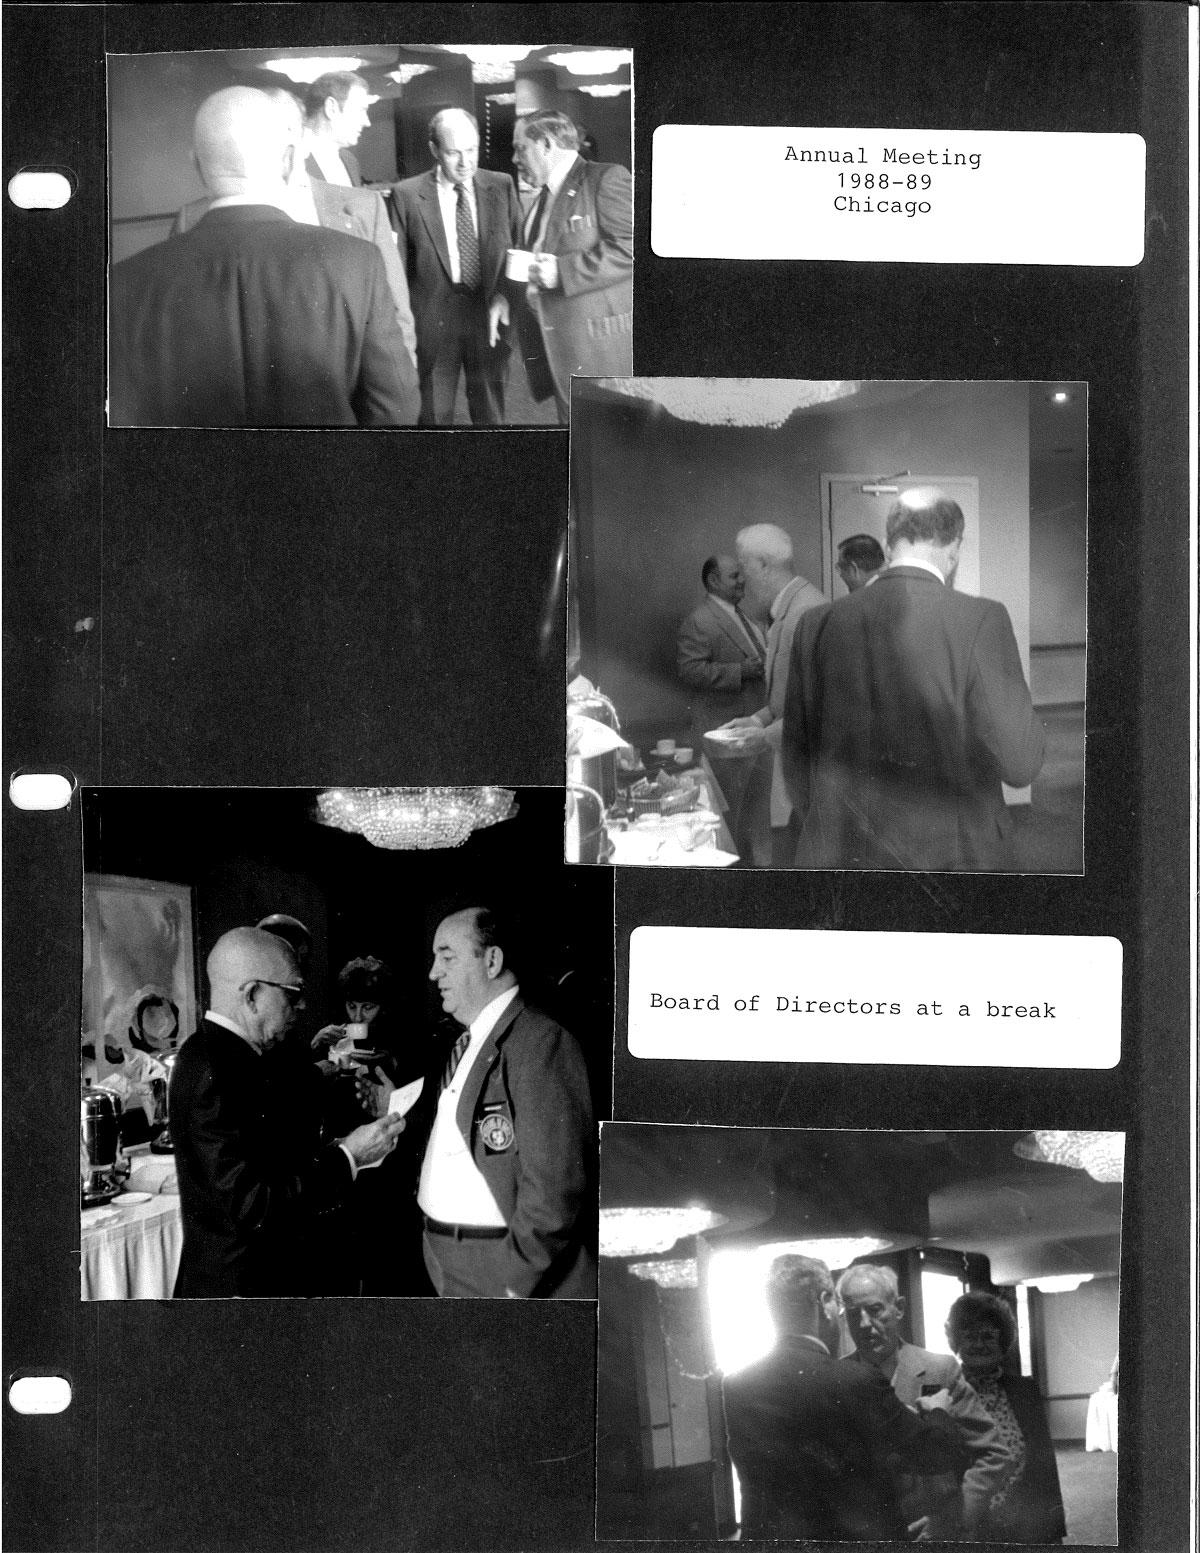 VOS-meeting-1988-1989